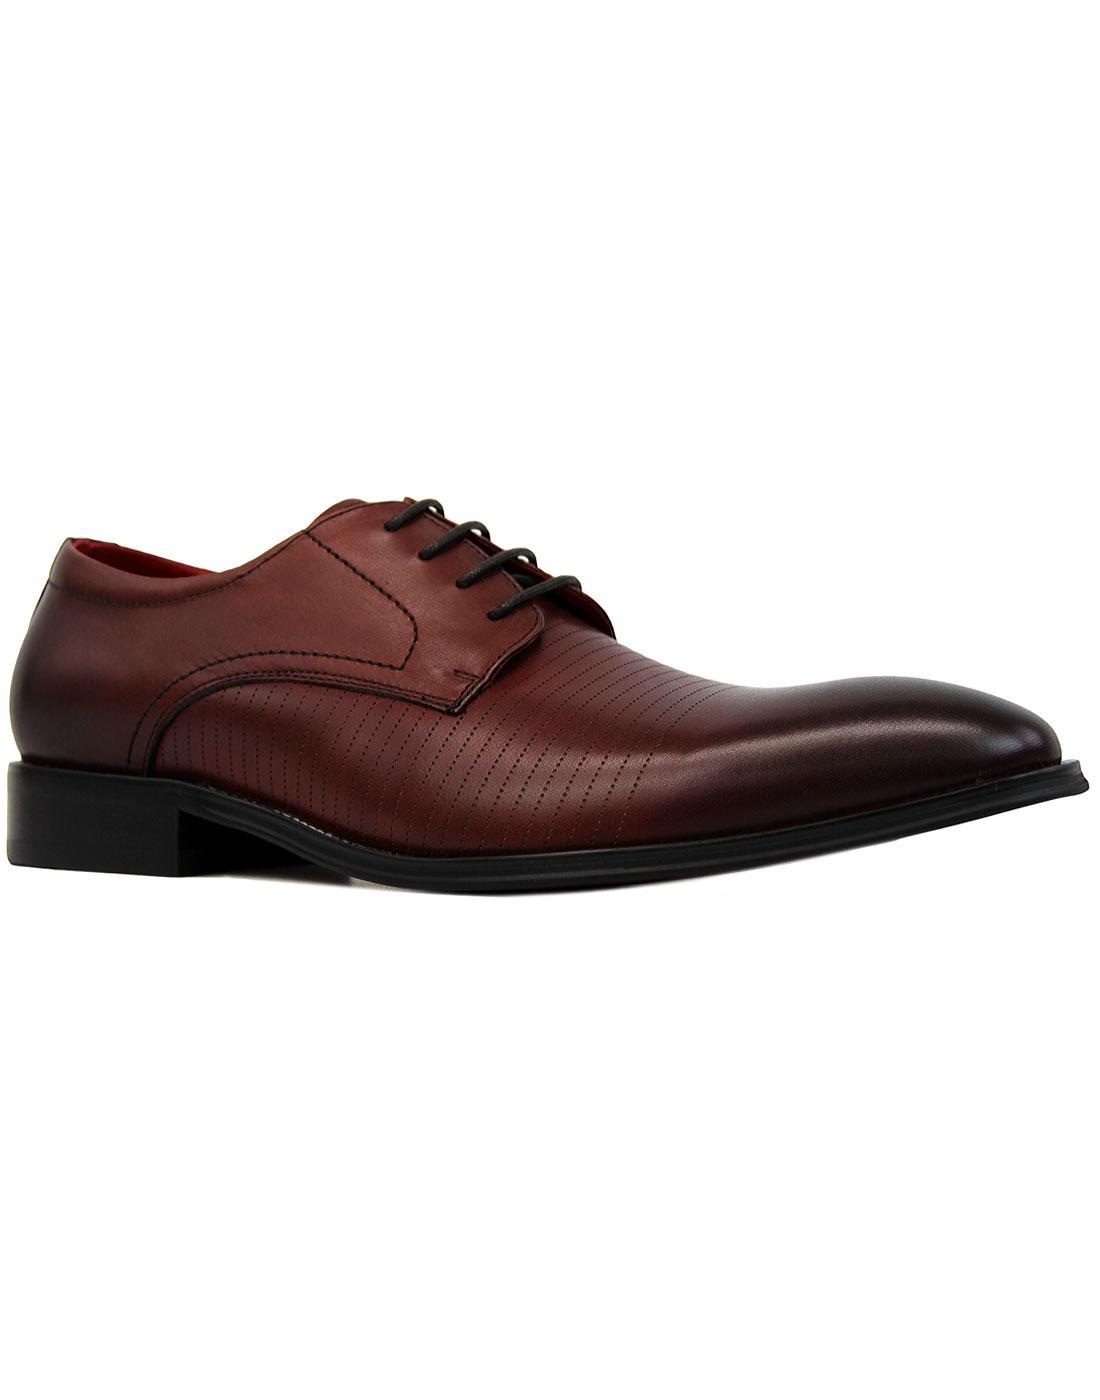 Stu Lace PAOLO VANDINI 60s Mod Pinstripe Shoes (W)